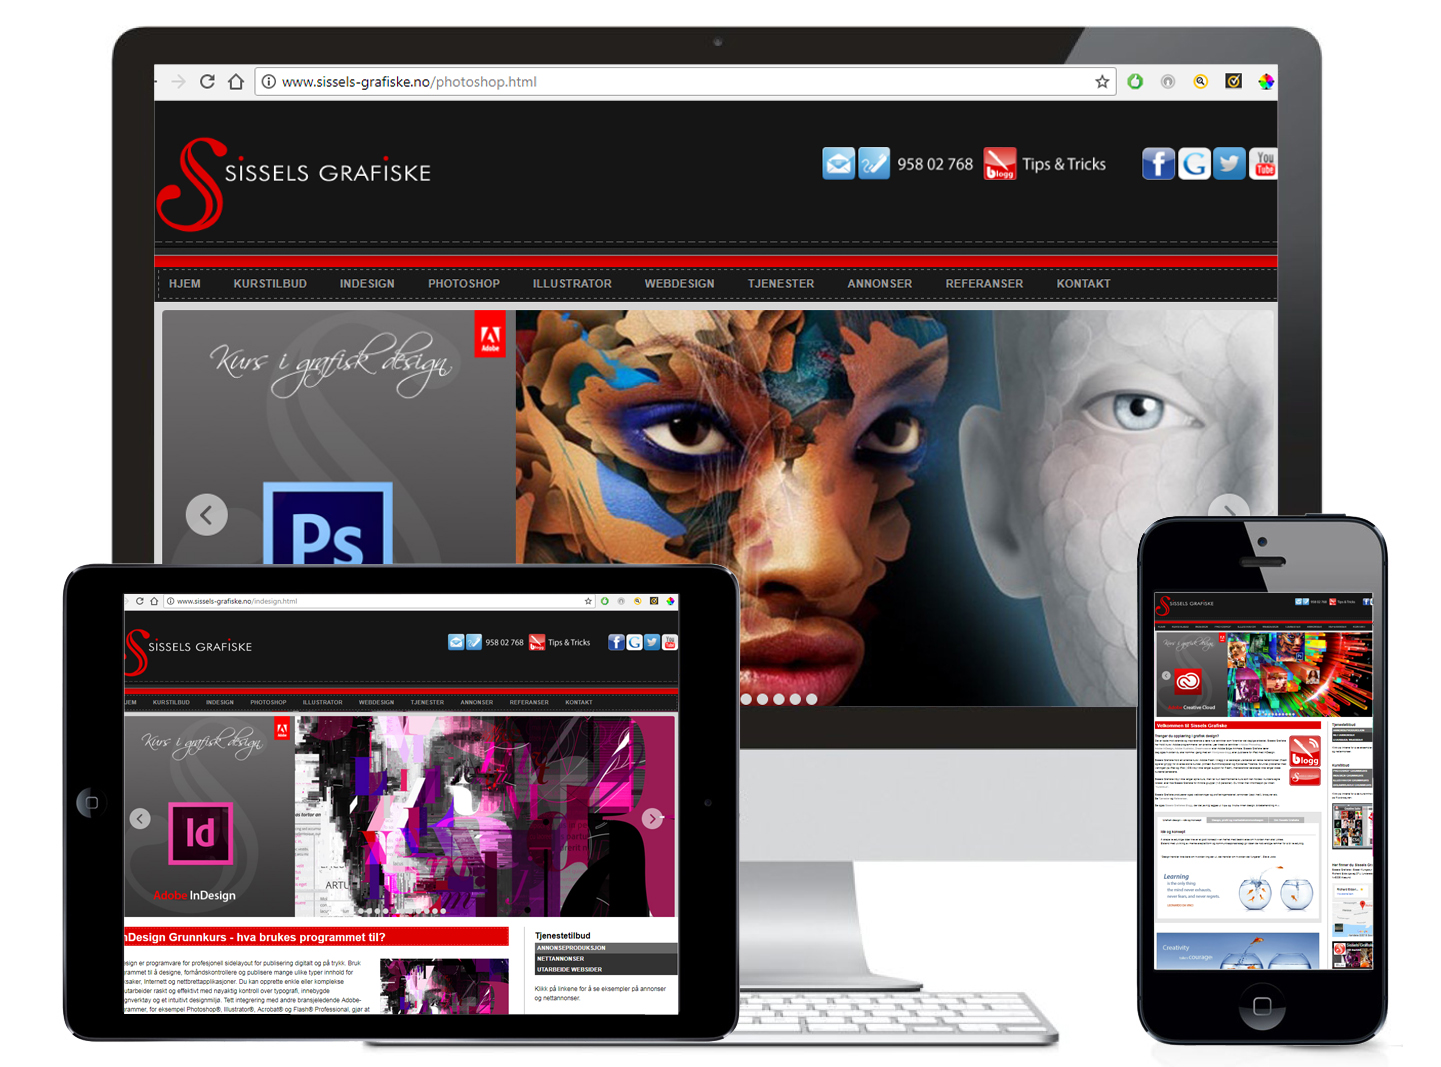 Desktop_tablet_mobile_web02.jpg